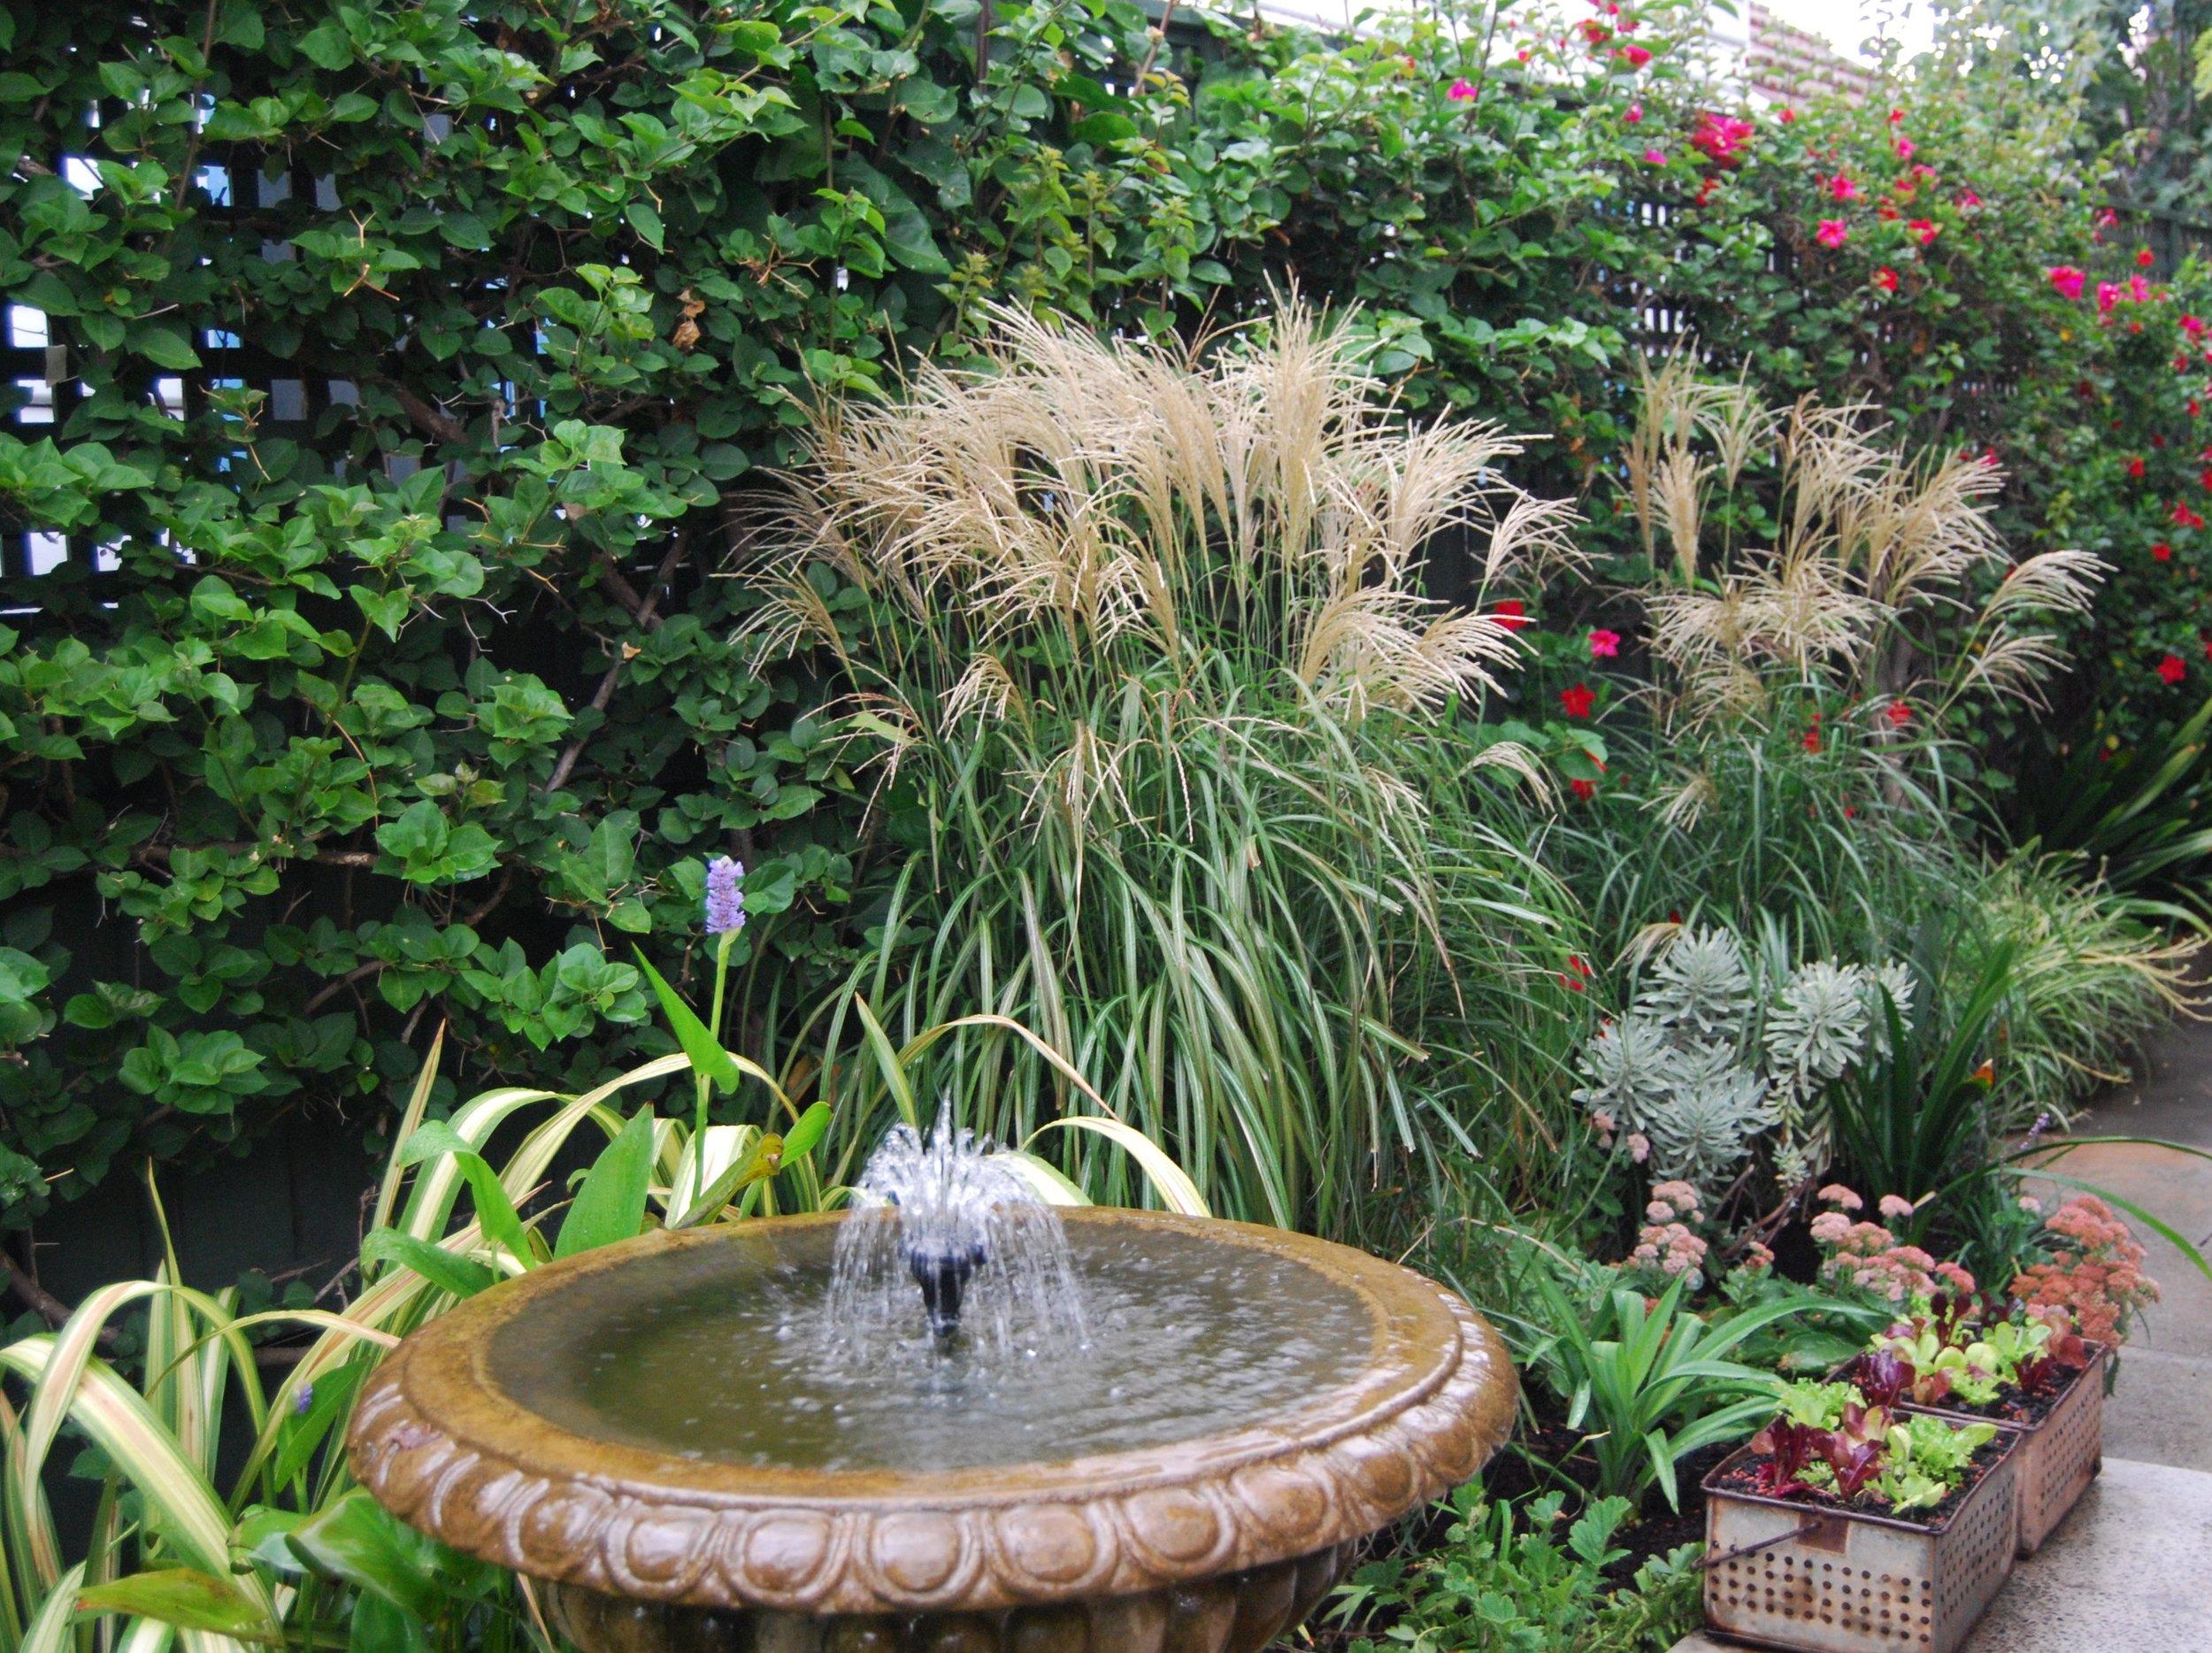 Miscanthus adding texture to the garden